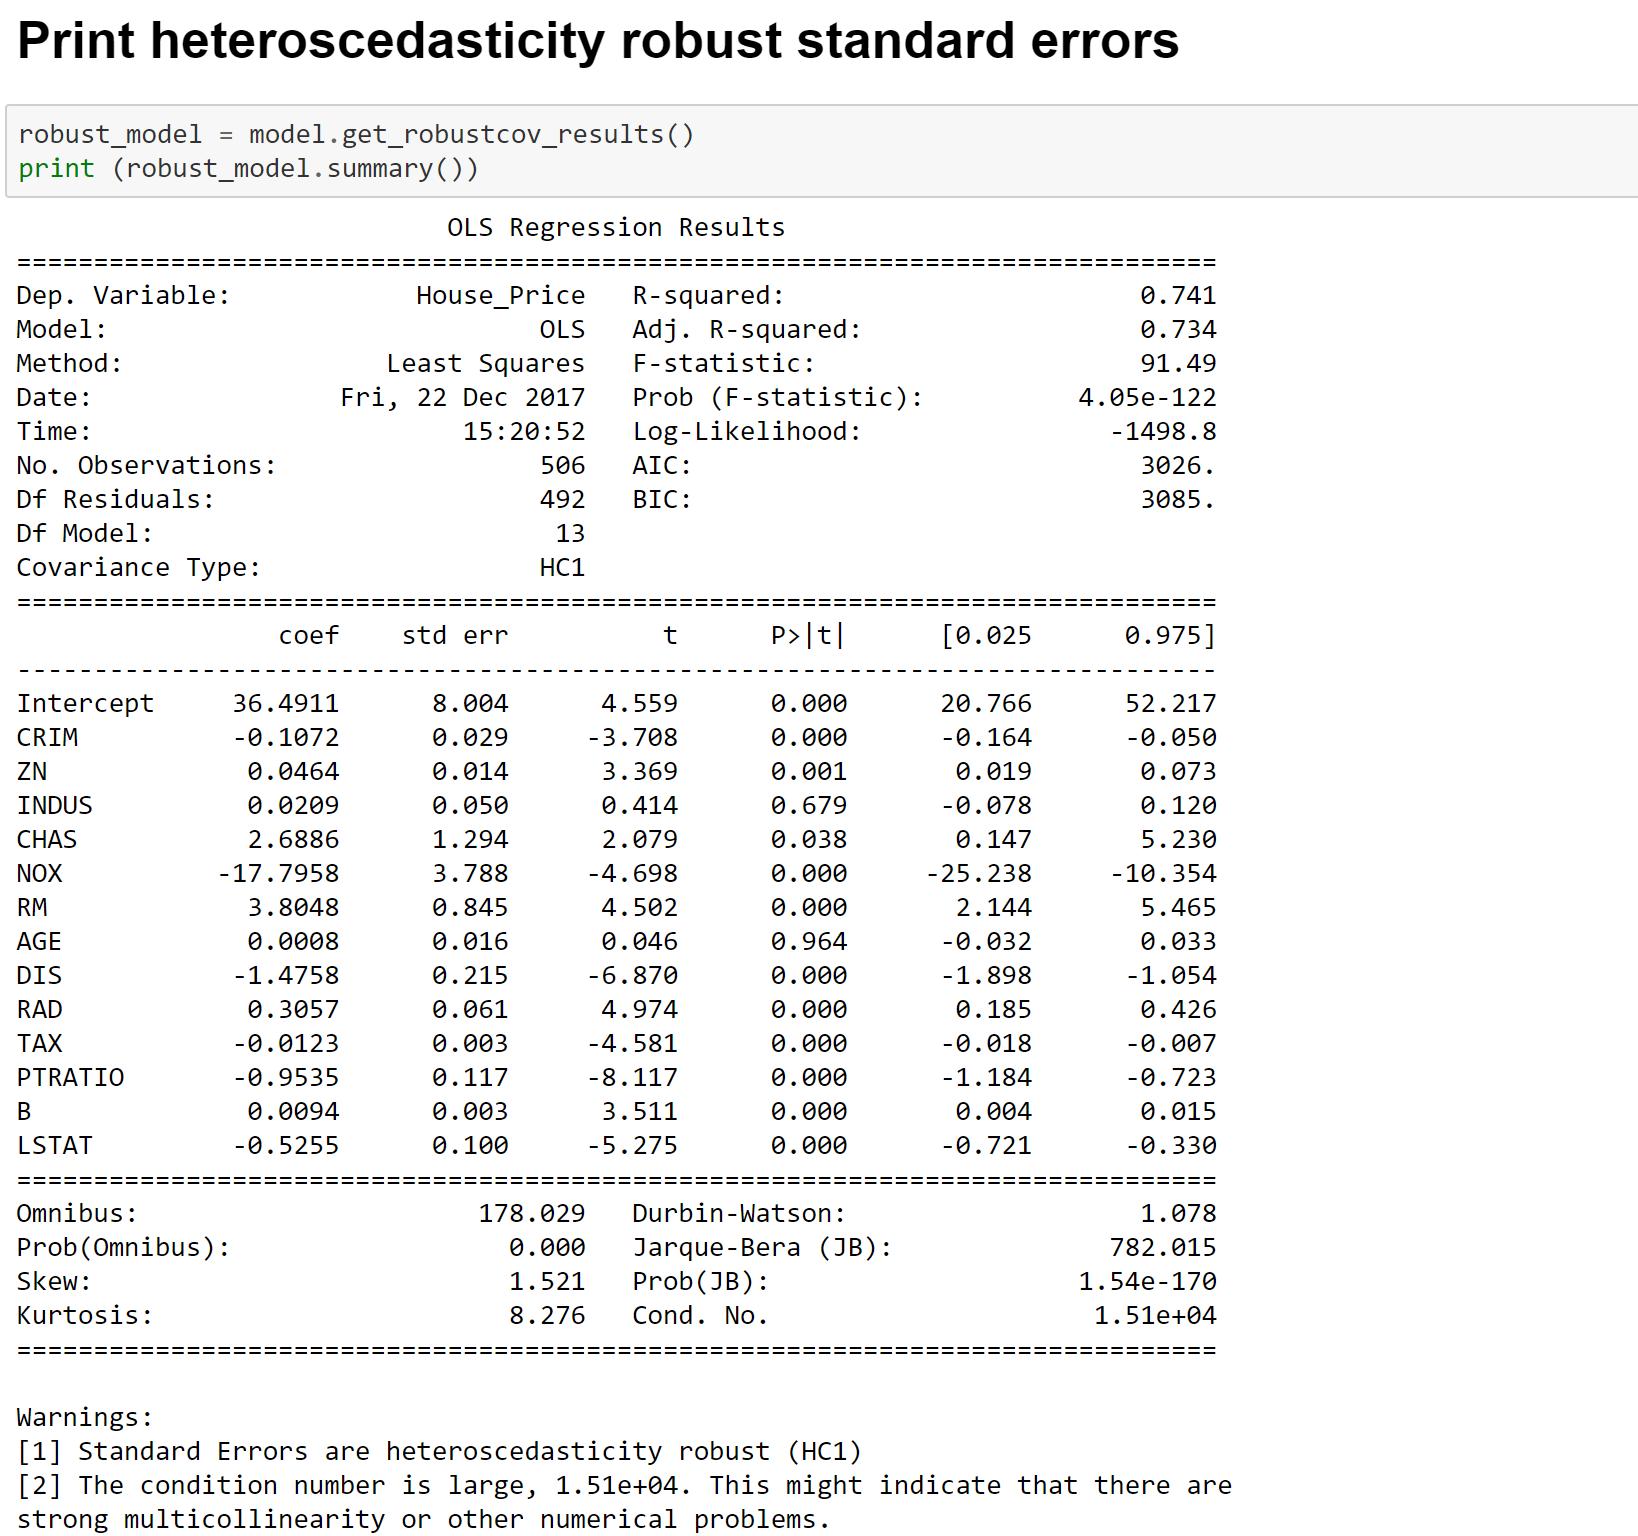 Heteroscedasticity Consistent Linear Regression Estimates